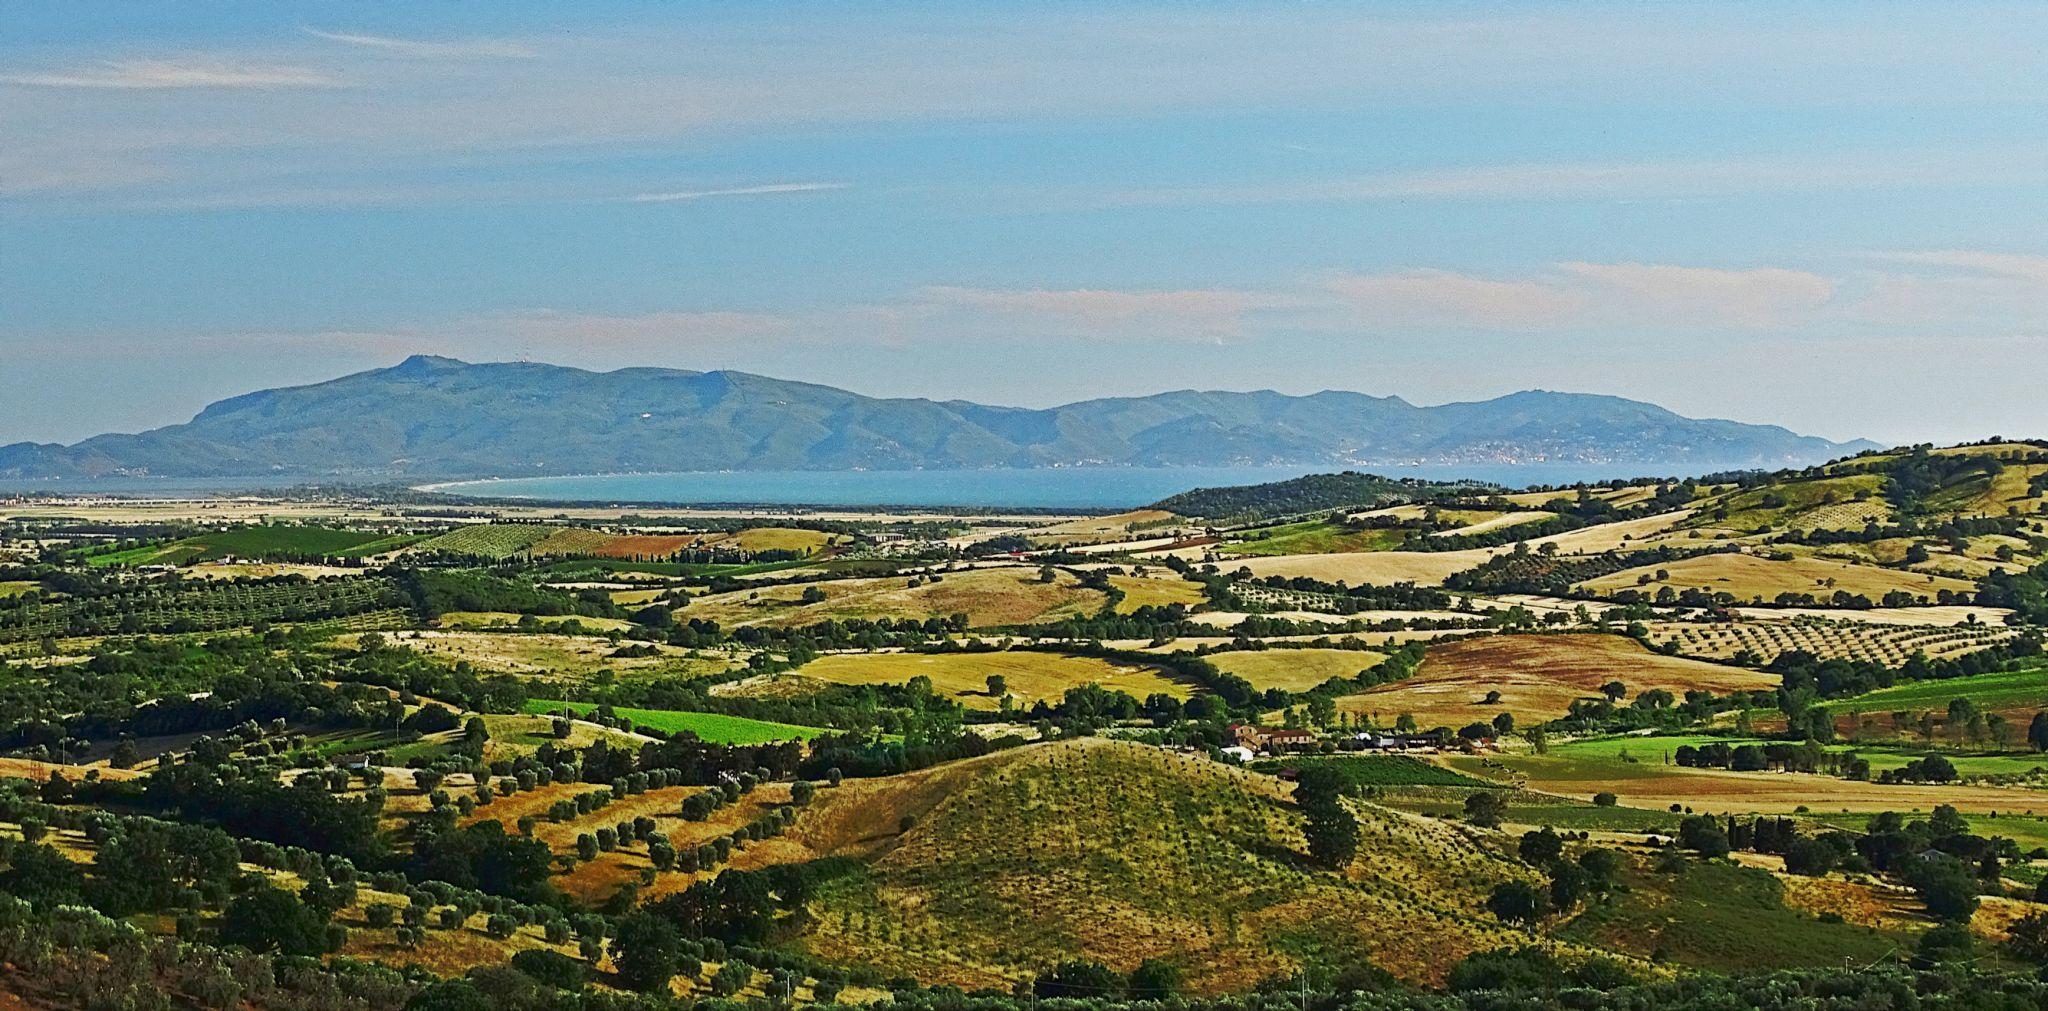 Montiano, Italy